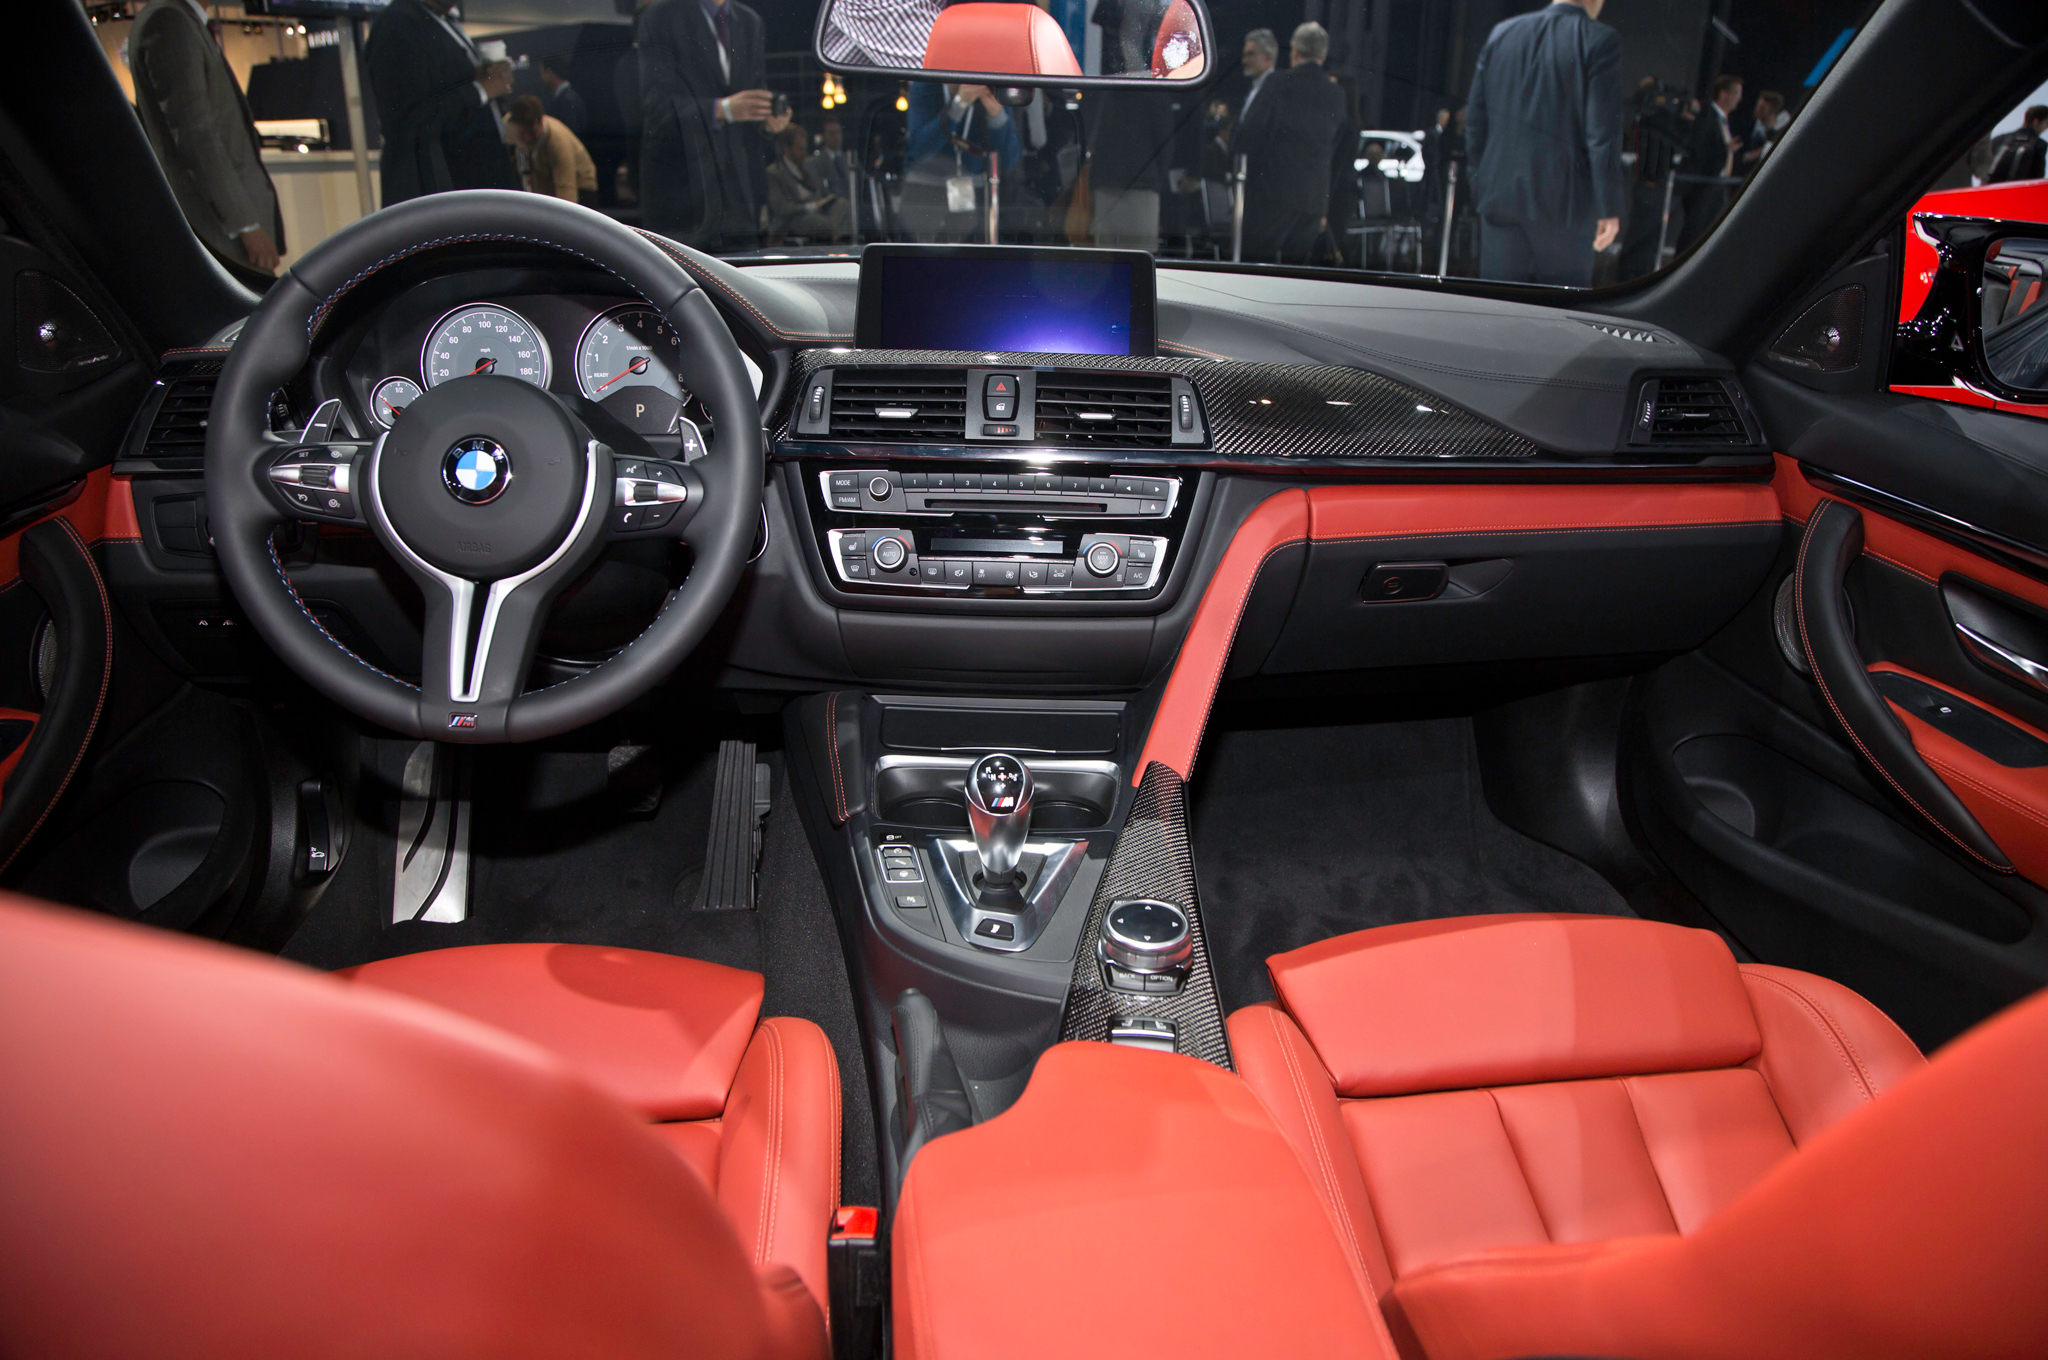 New 2015 BMW M4 Convertible Dashboard